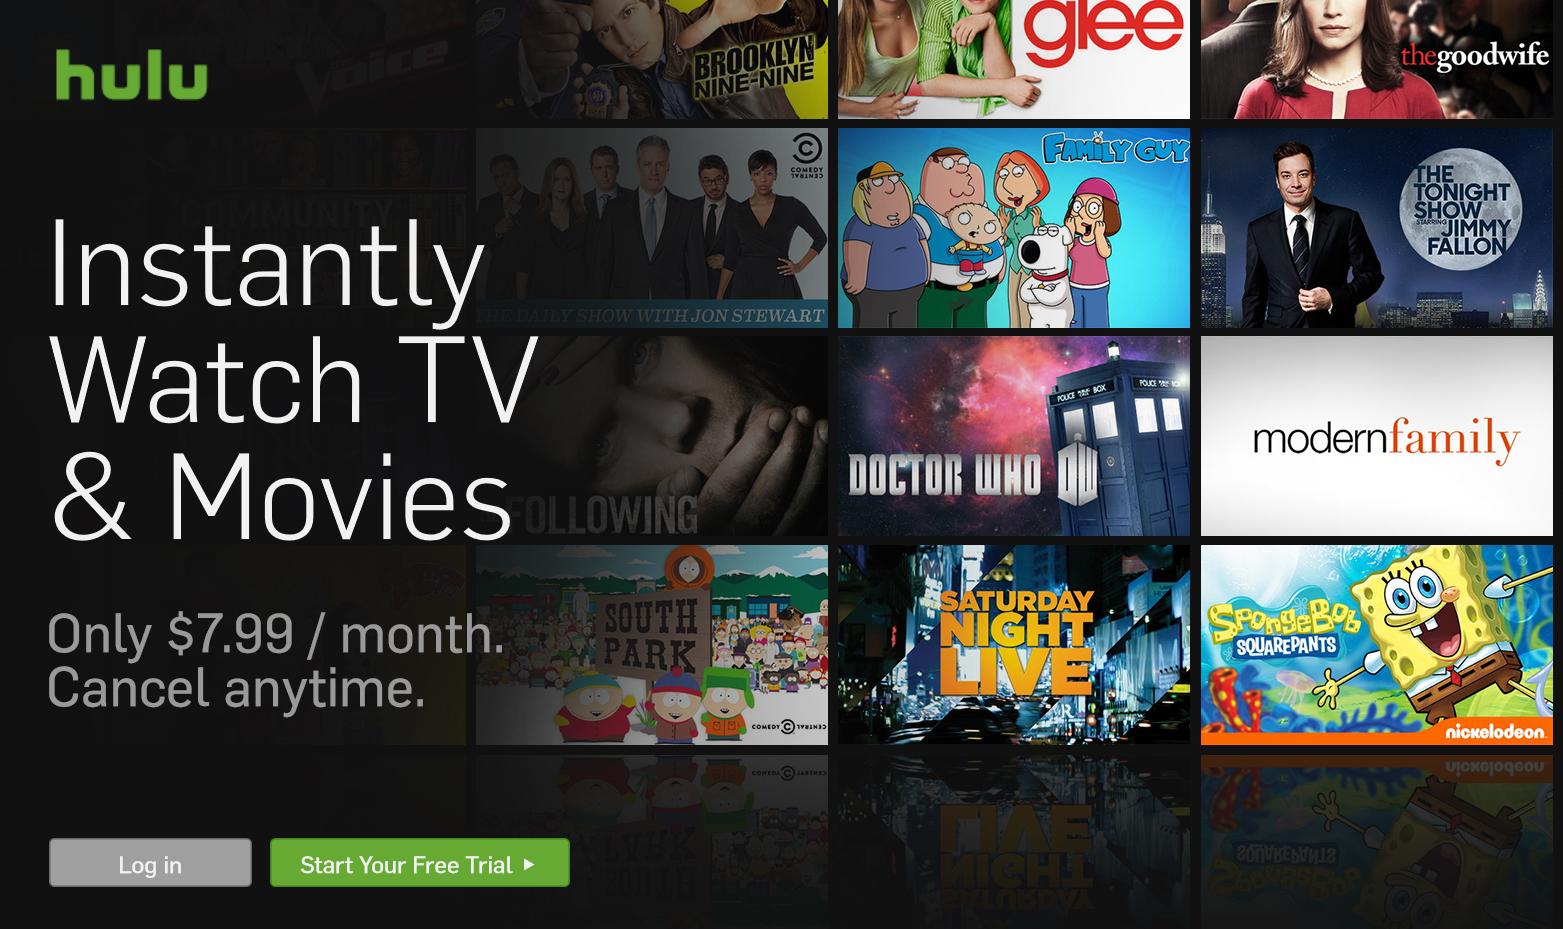 Windows 10 Receives Universal Hulu App • Trinity News Daily - U S